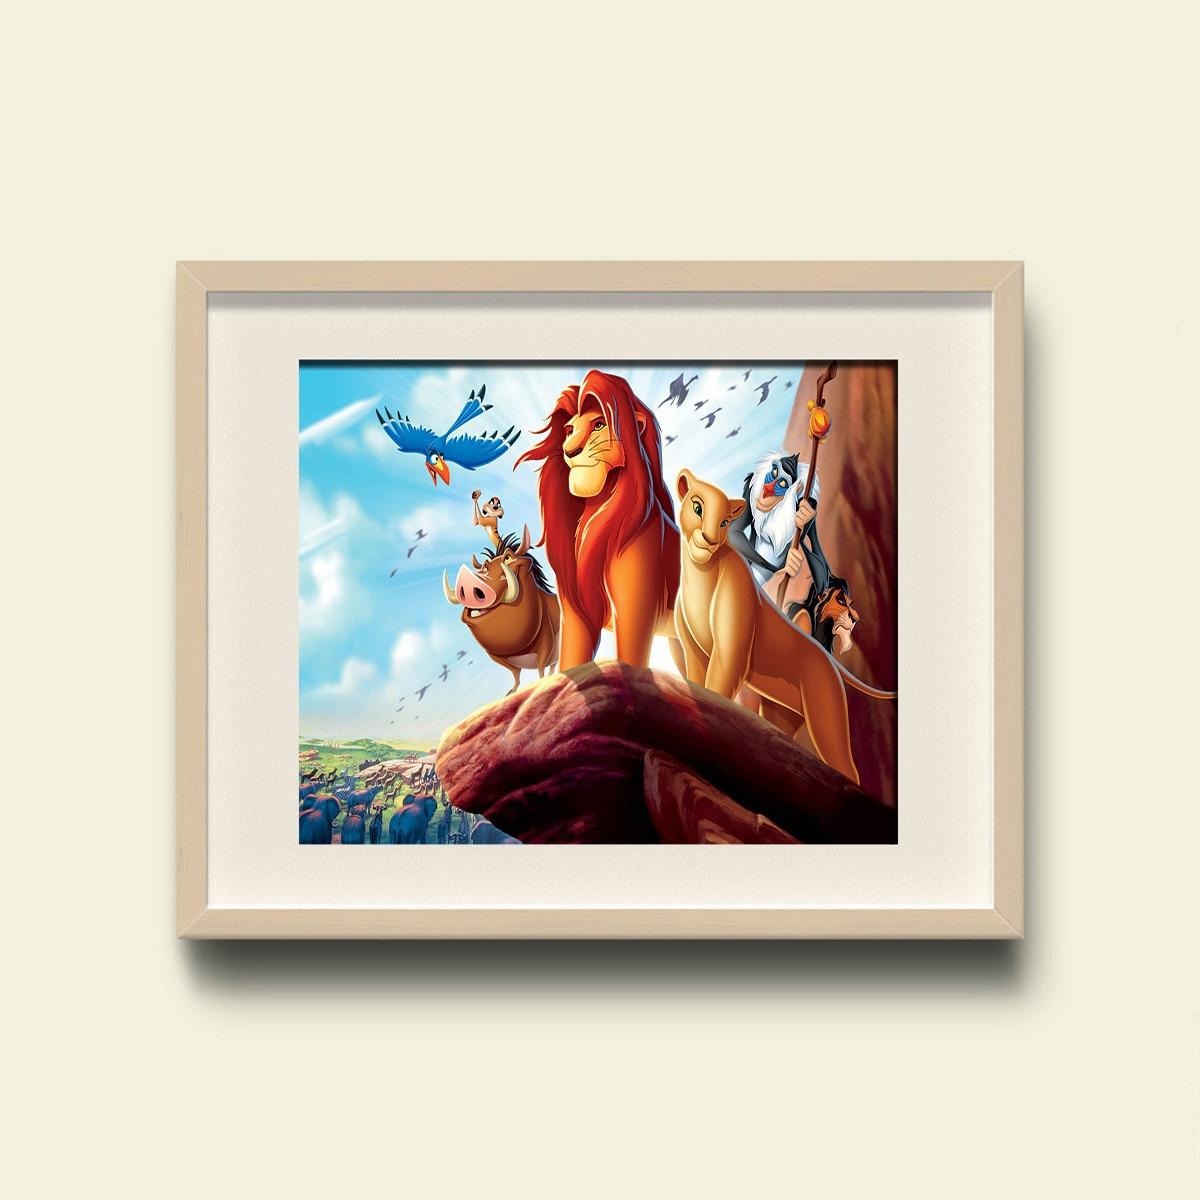 DHgate AliExpress Modern Animation Wall Art Lion King Simba Home Decorative Painting